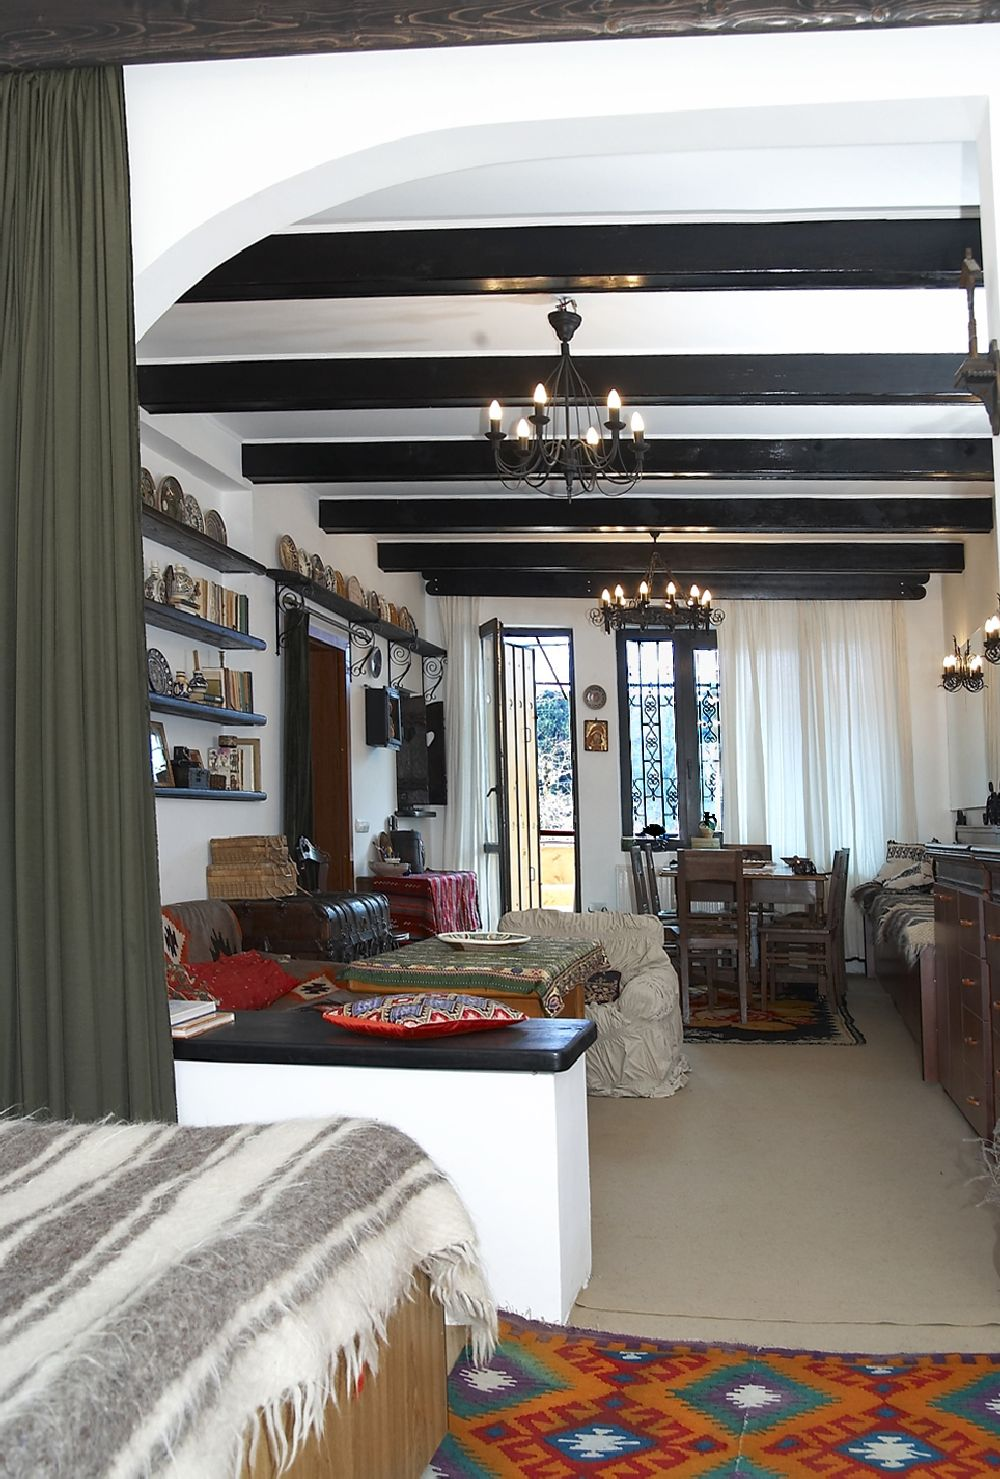 adelaparvu.com despre Anca Ciuciulin si casa ei cu decor traditional romanesc (13)